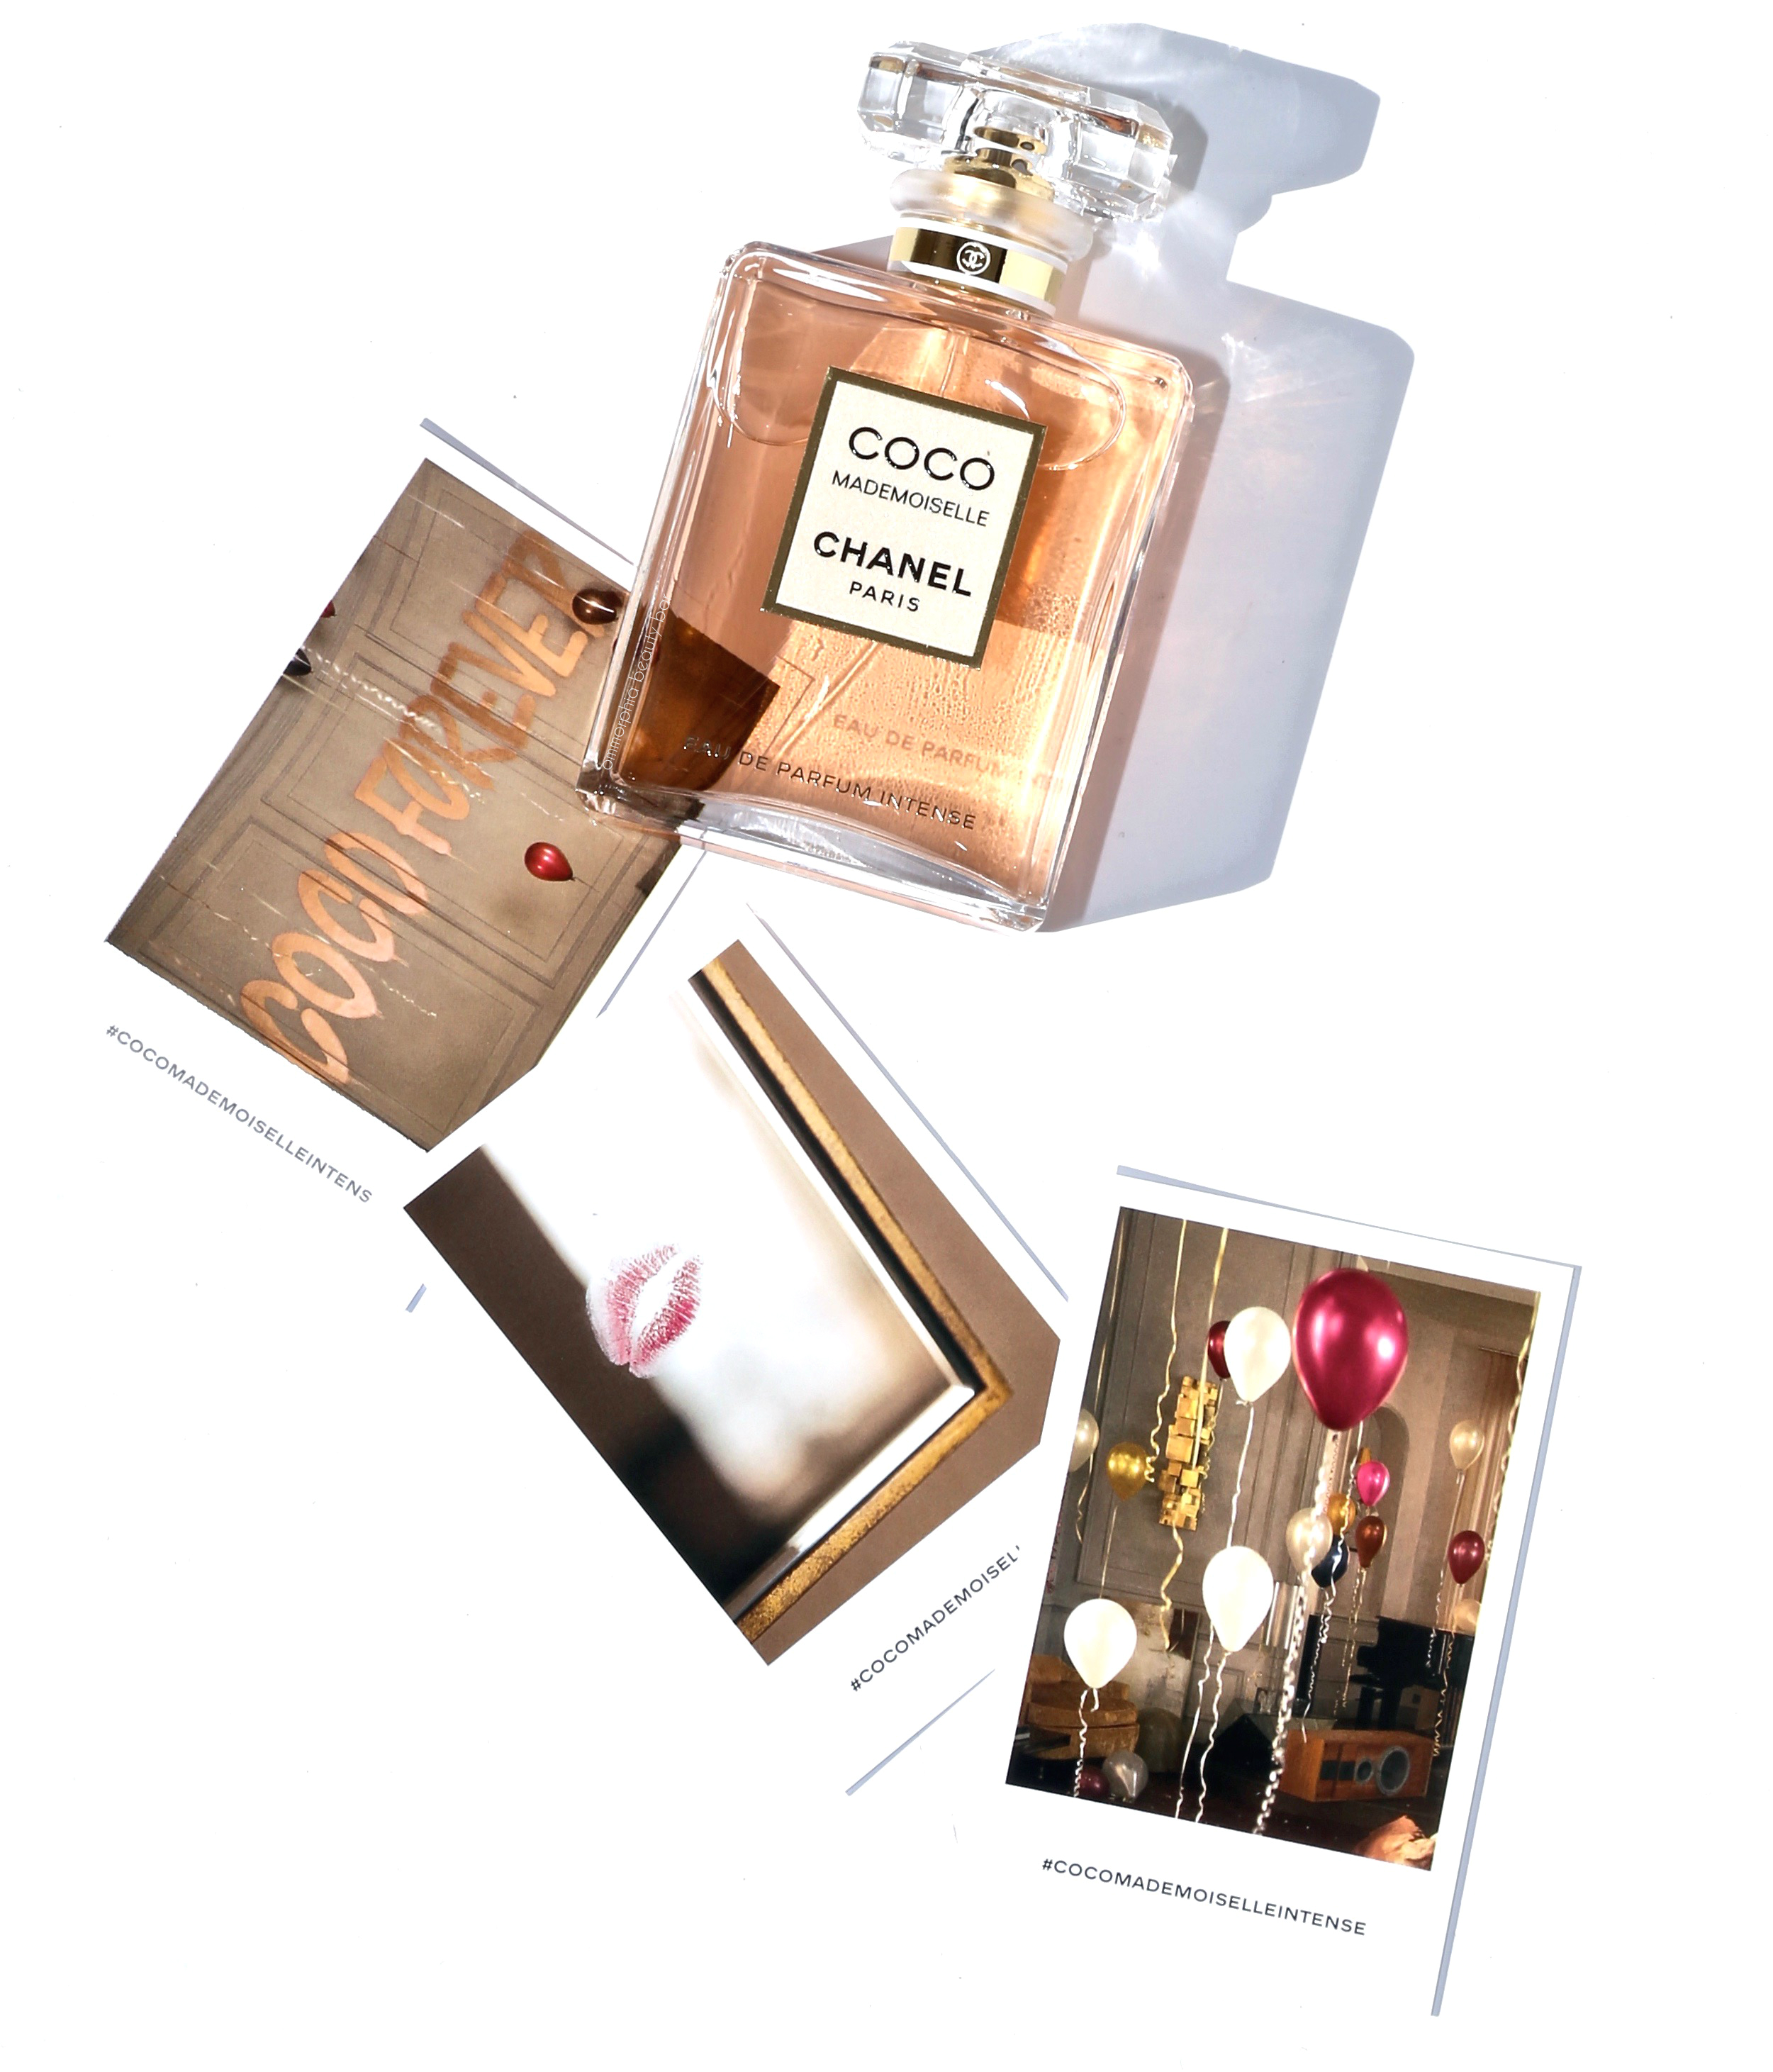 chanel coco mademoiselle eau de parfum intense ommorphia beauty bar bloglovin. Black Bedroom Furniture Sets. Home Design Ideas